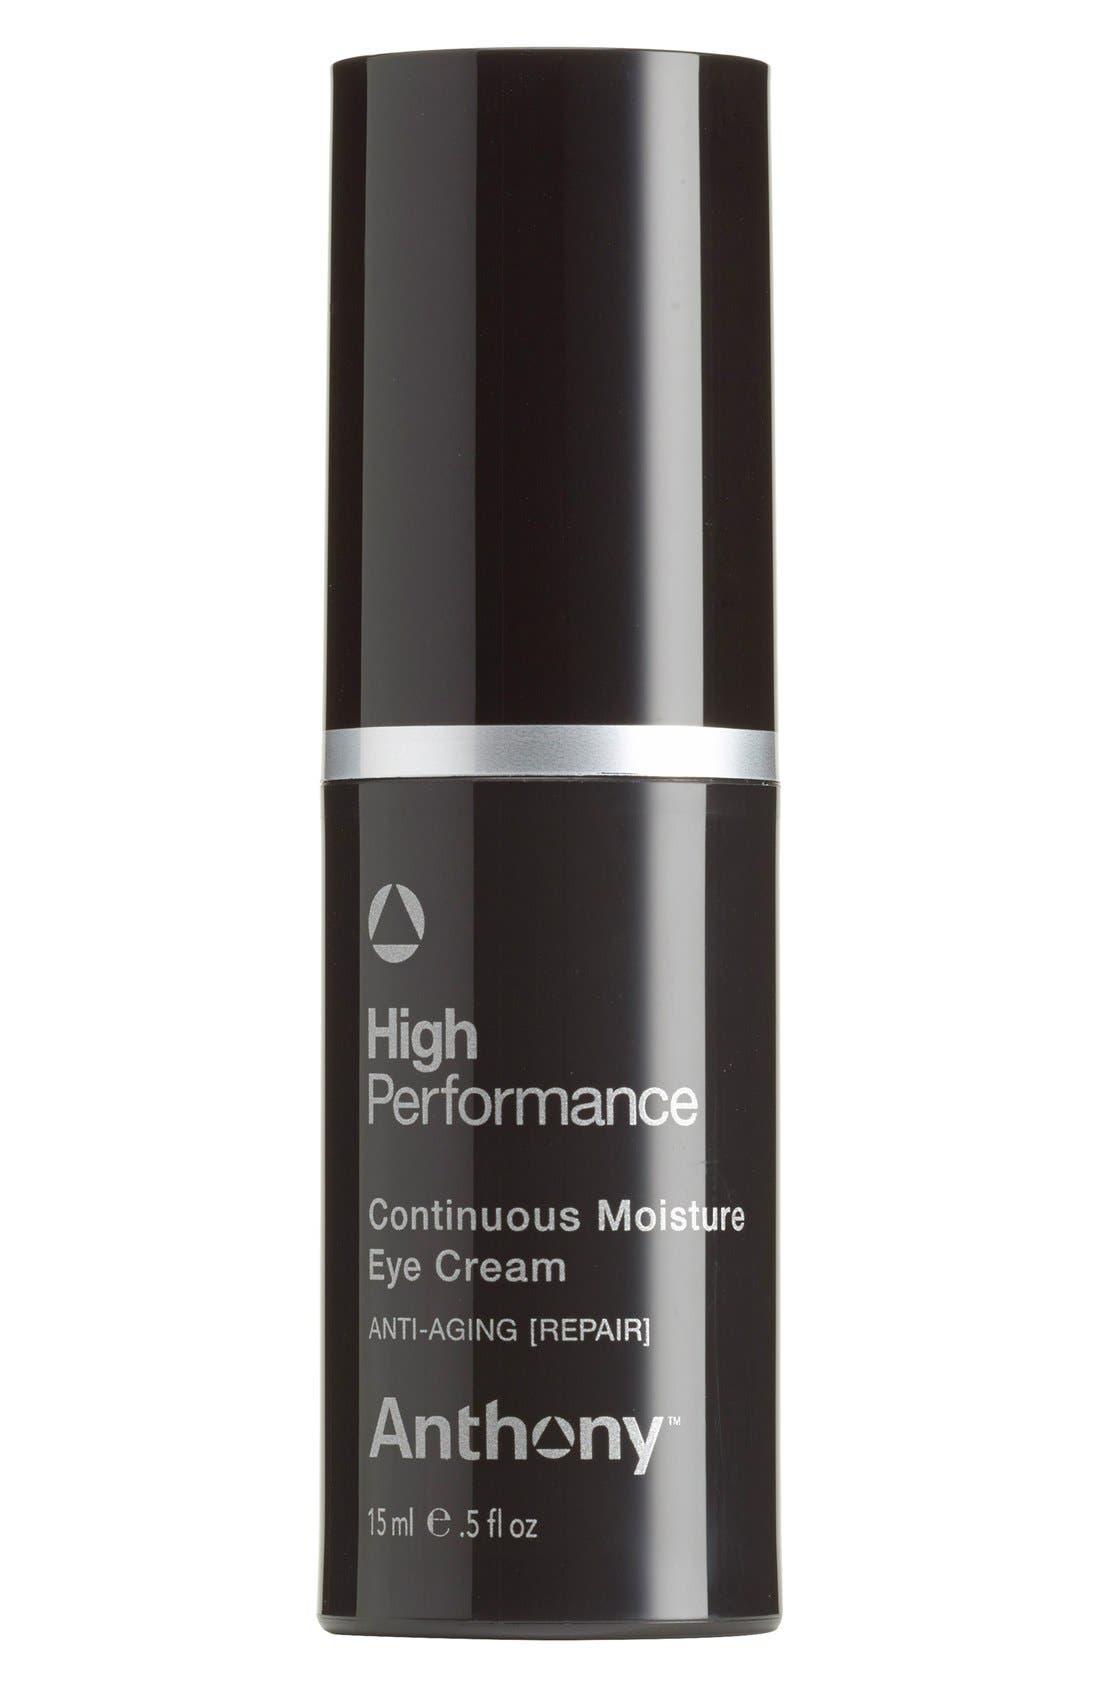 Anthony™ High Performance Eye Cream